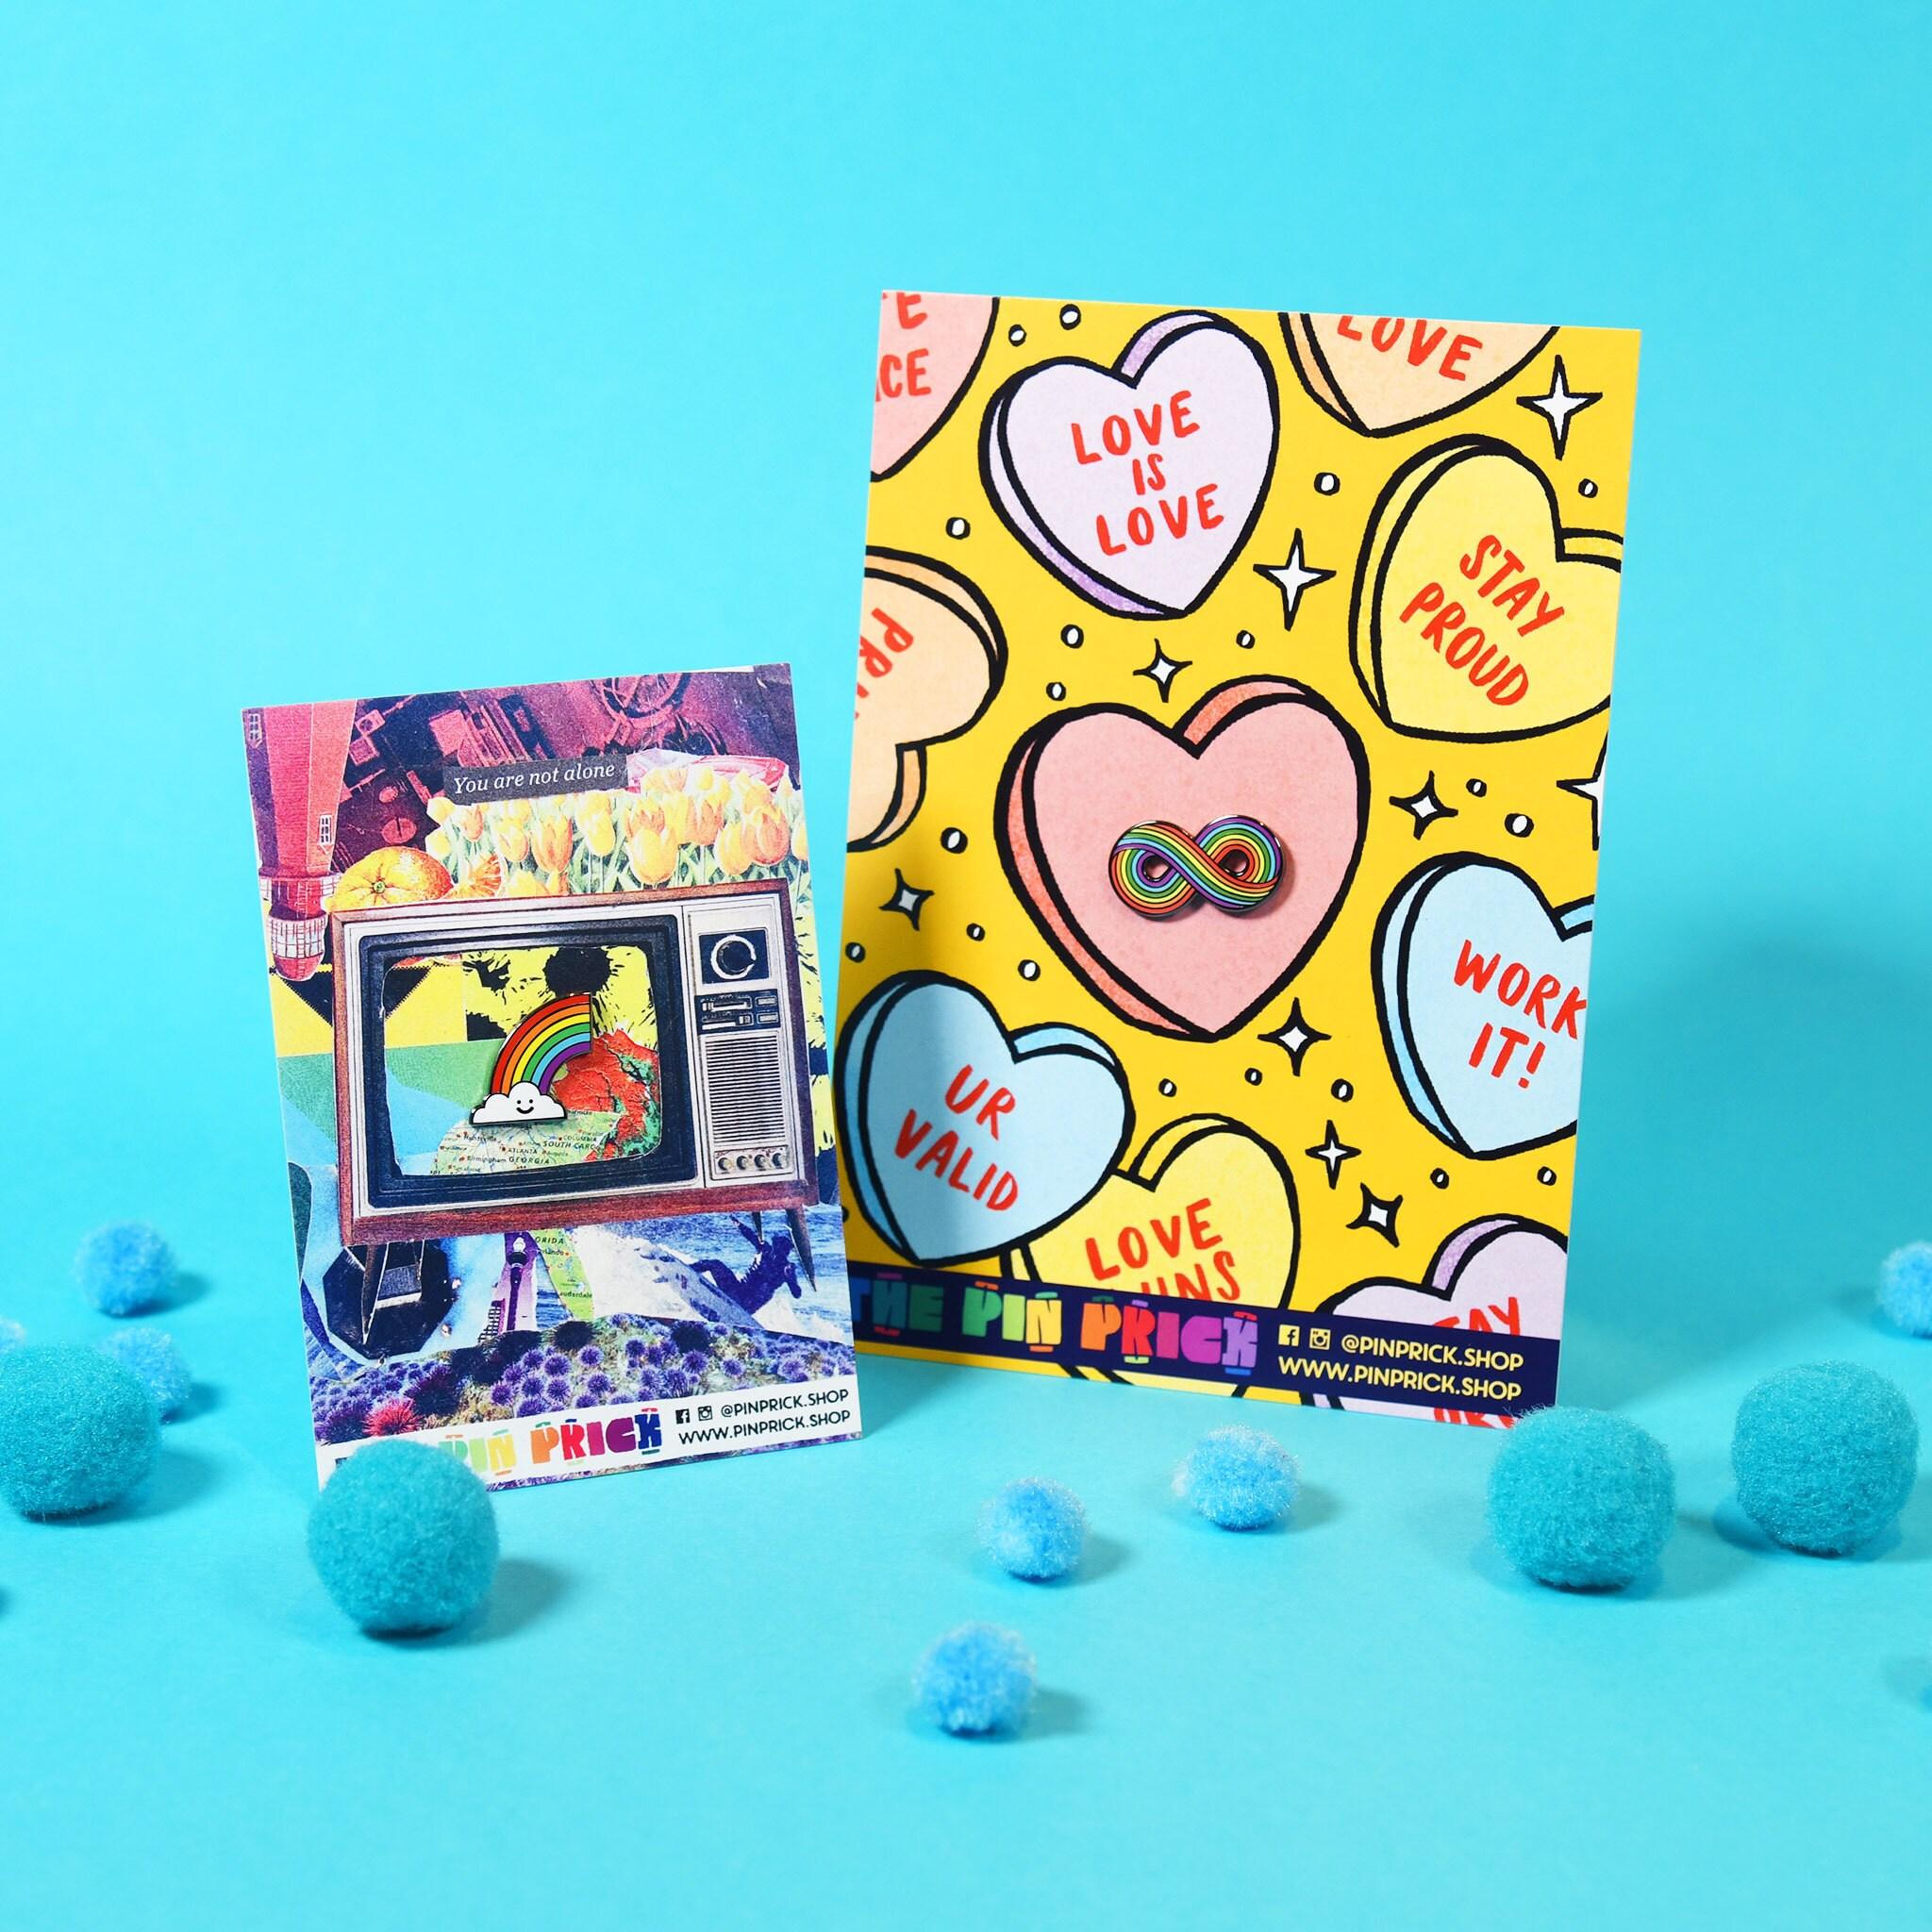 Rainbow Gay Enamel Pin Backing Card Design Ideas Collage Sophie McTear Ryan Berberet